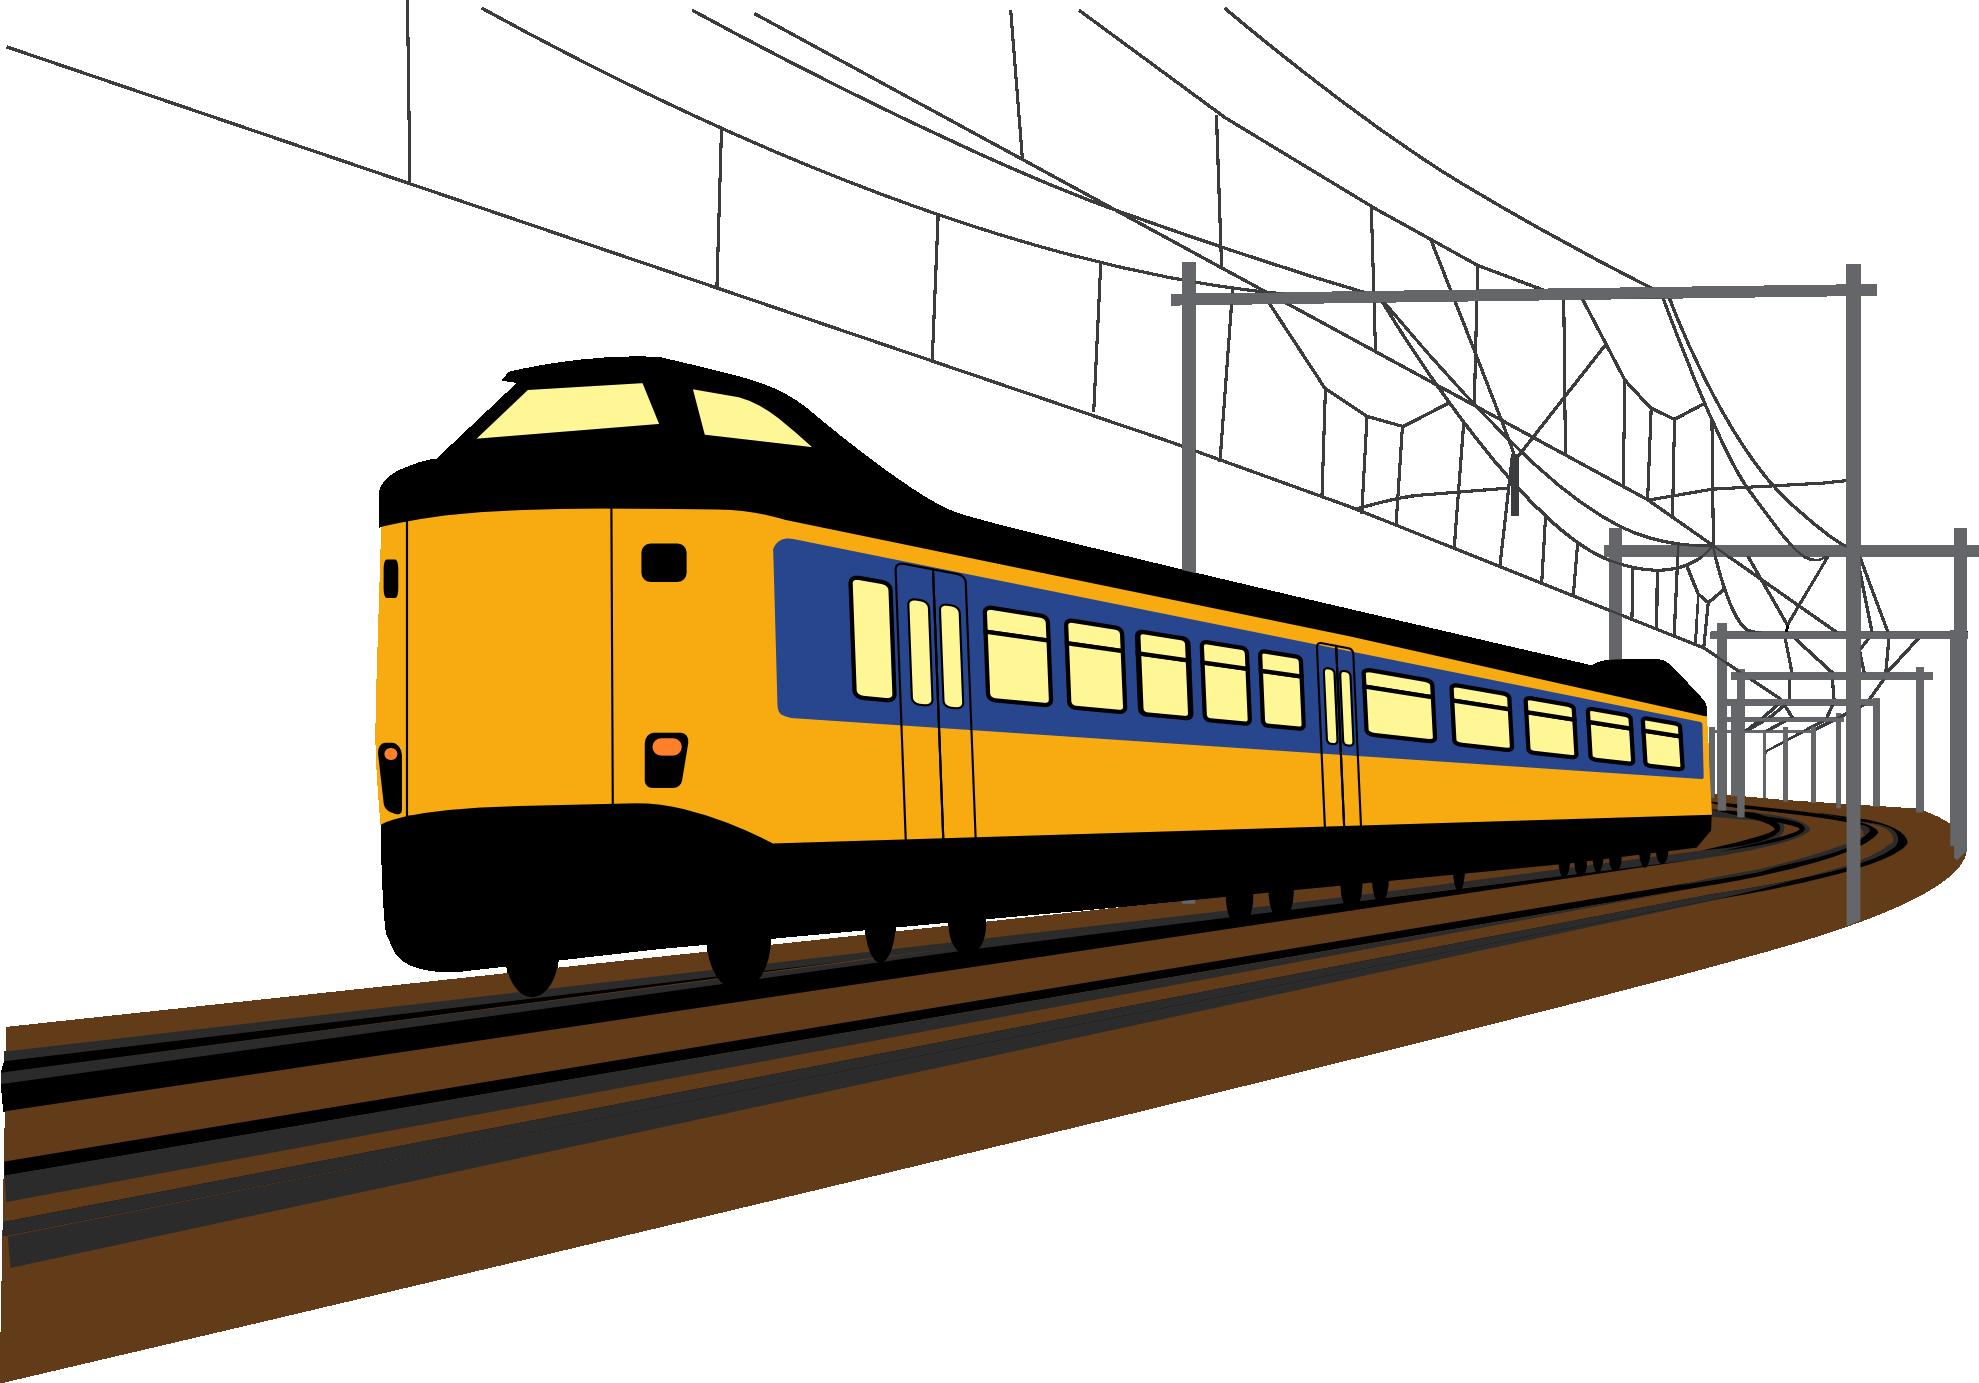 Clipart transportation train stock Free Train Vector Art, Download Free Clip Art, Free Clip Art on ... stock